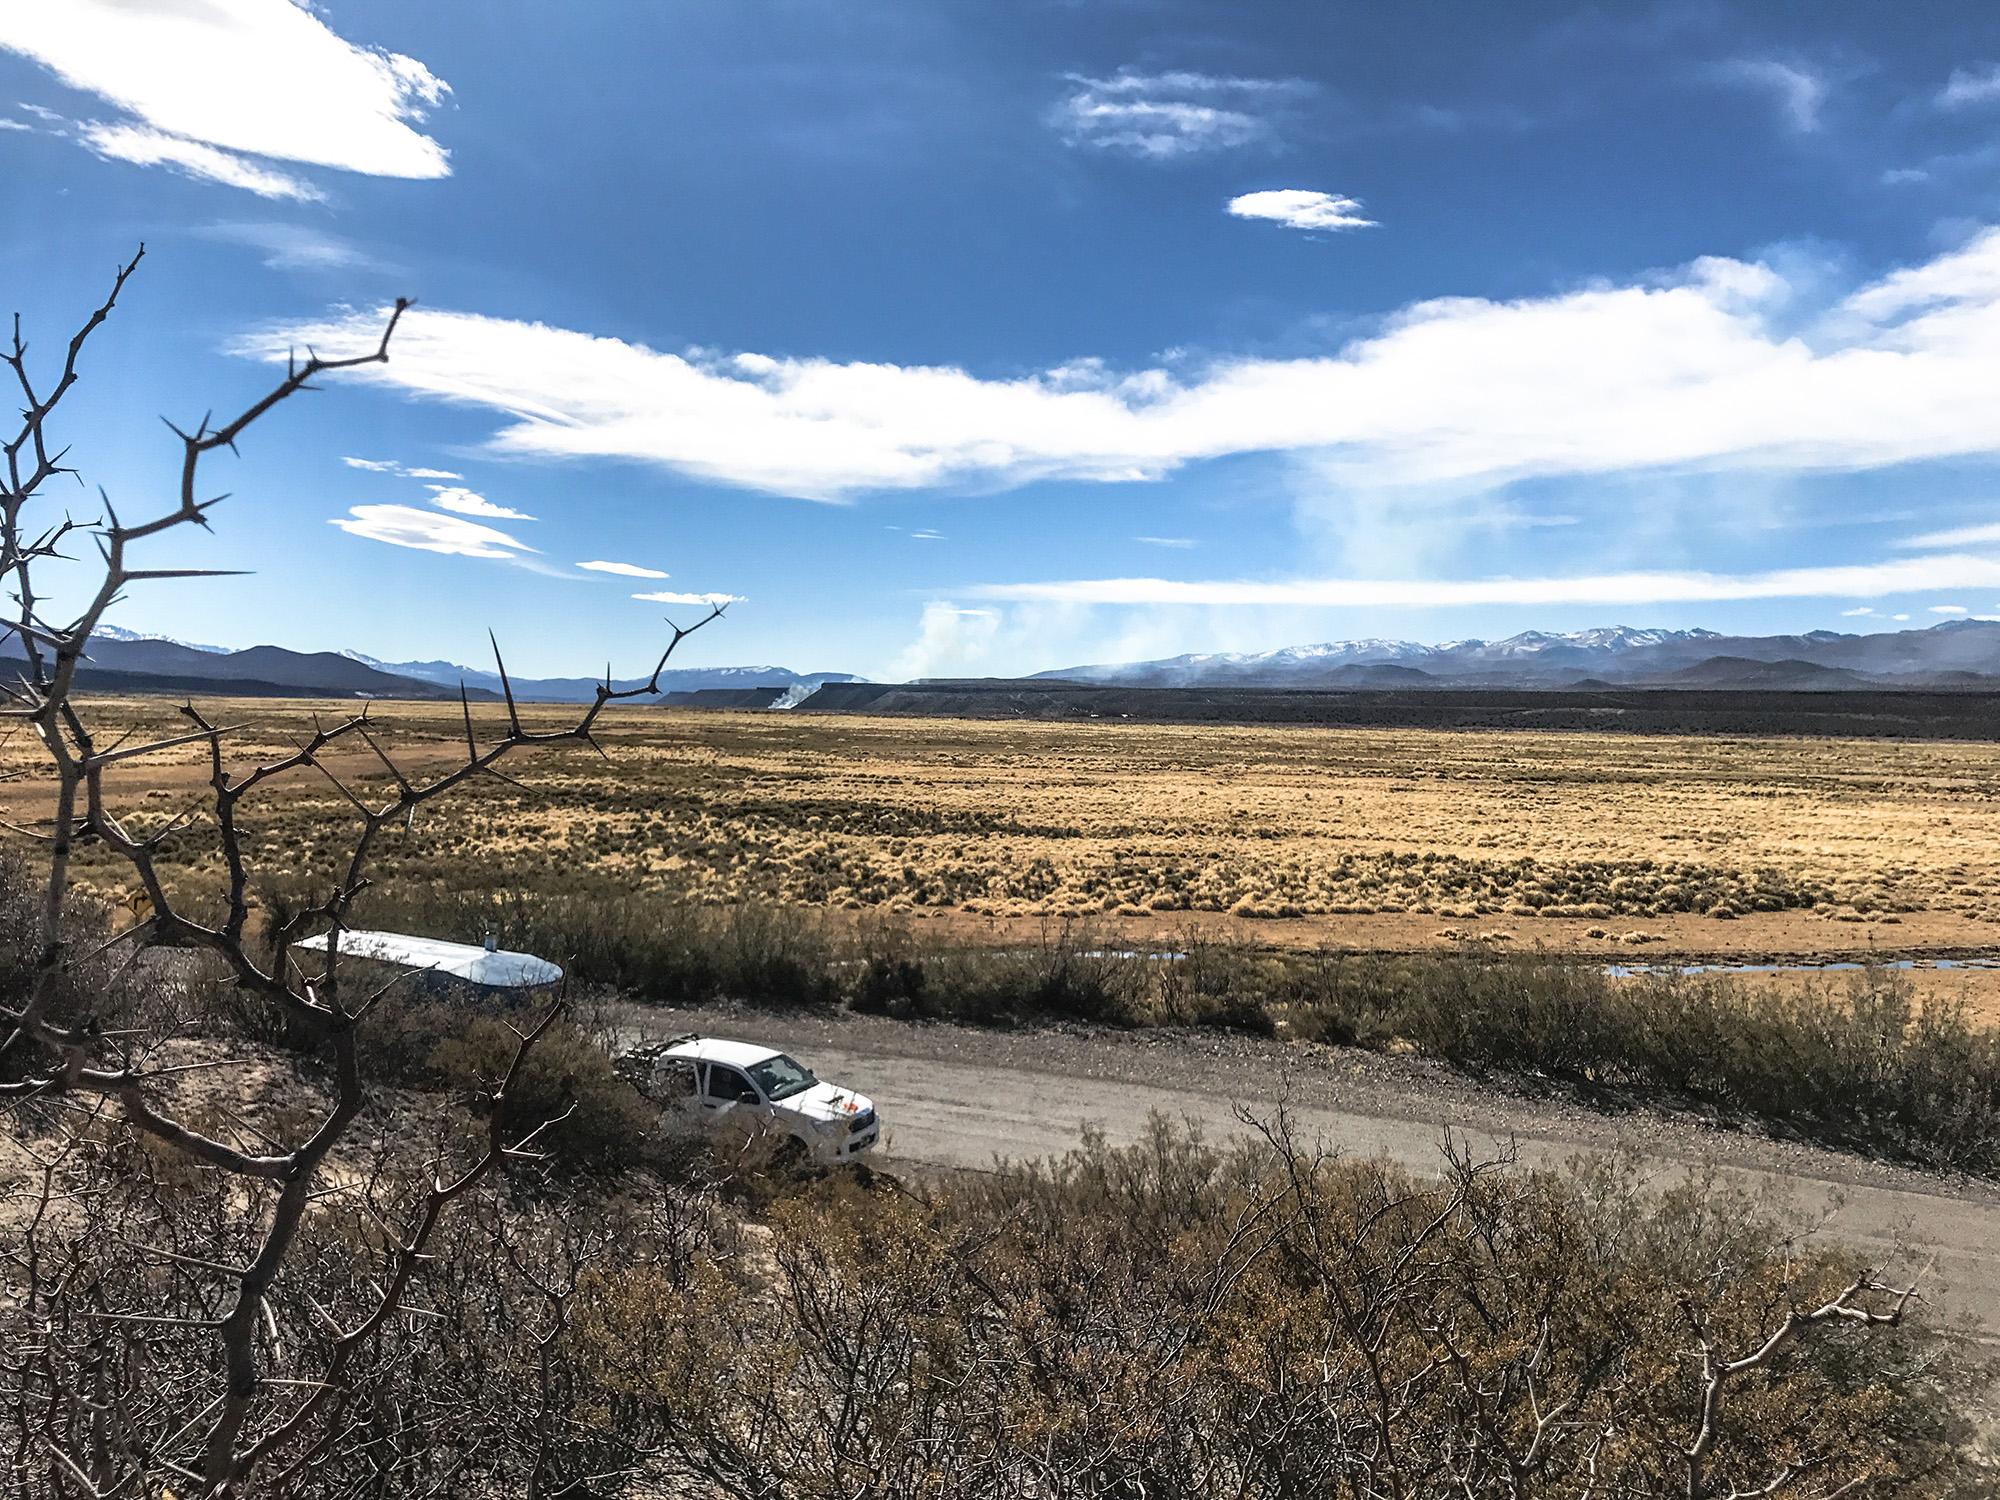 Un alto en la ruta 40 rumbo la Patagonia.